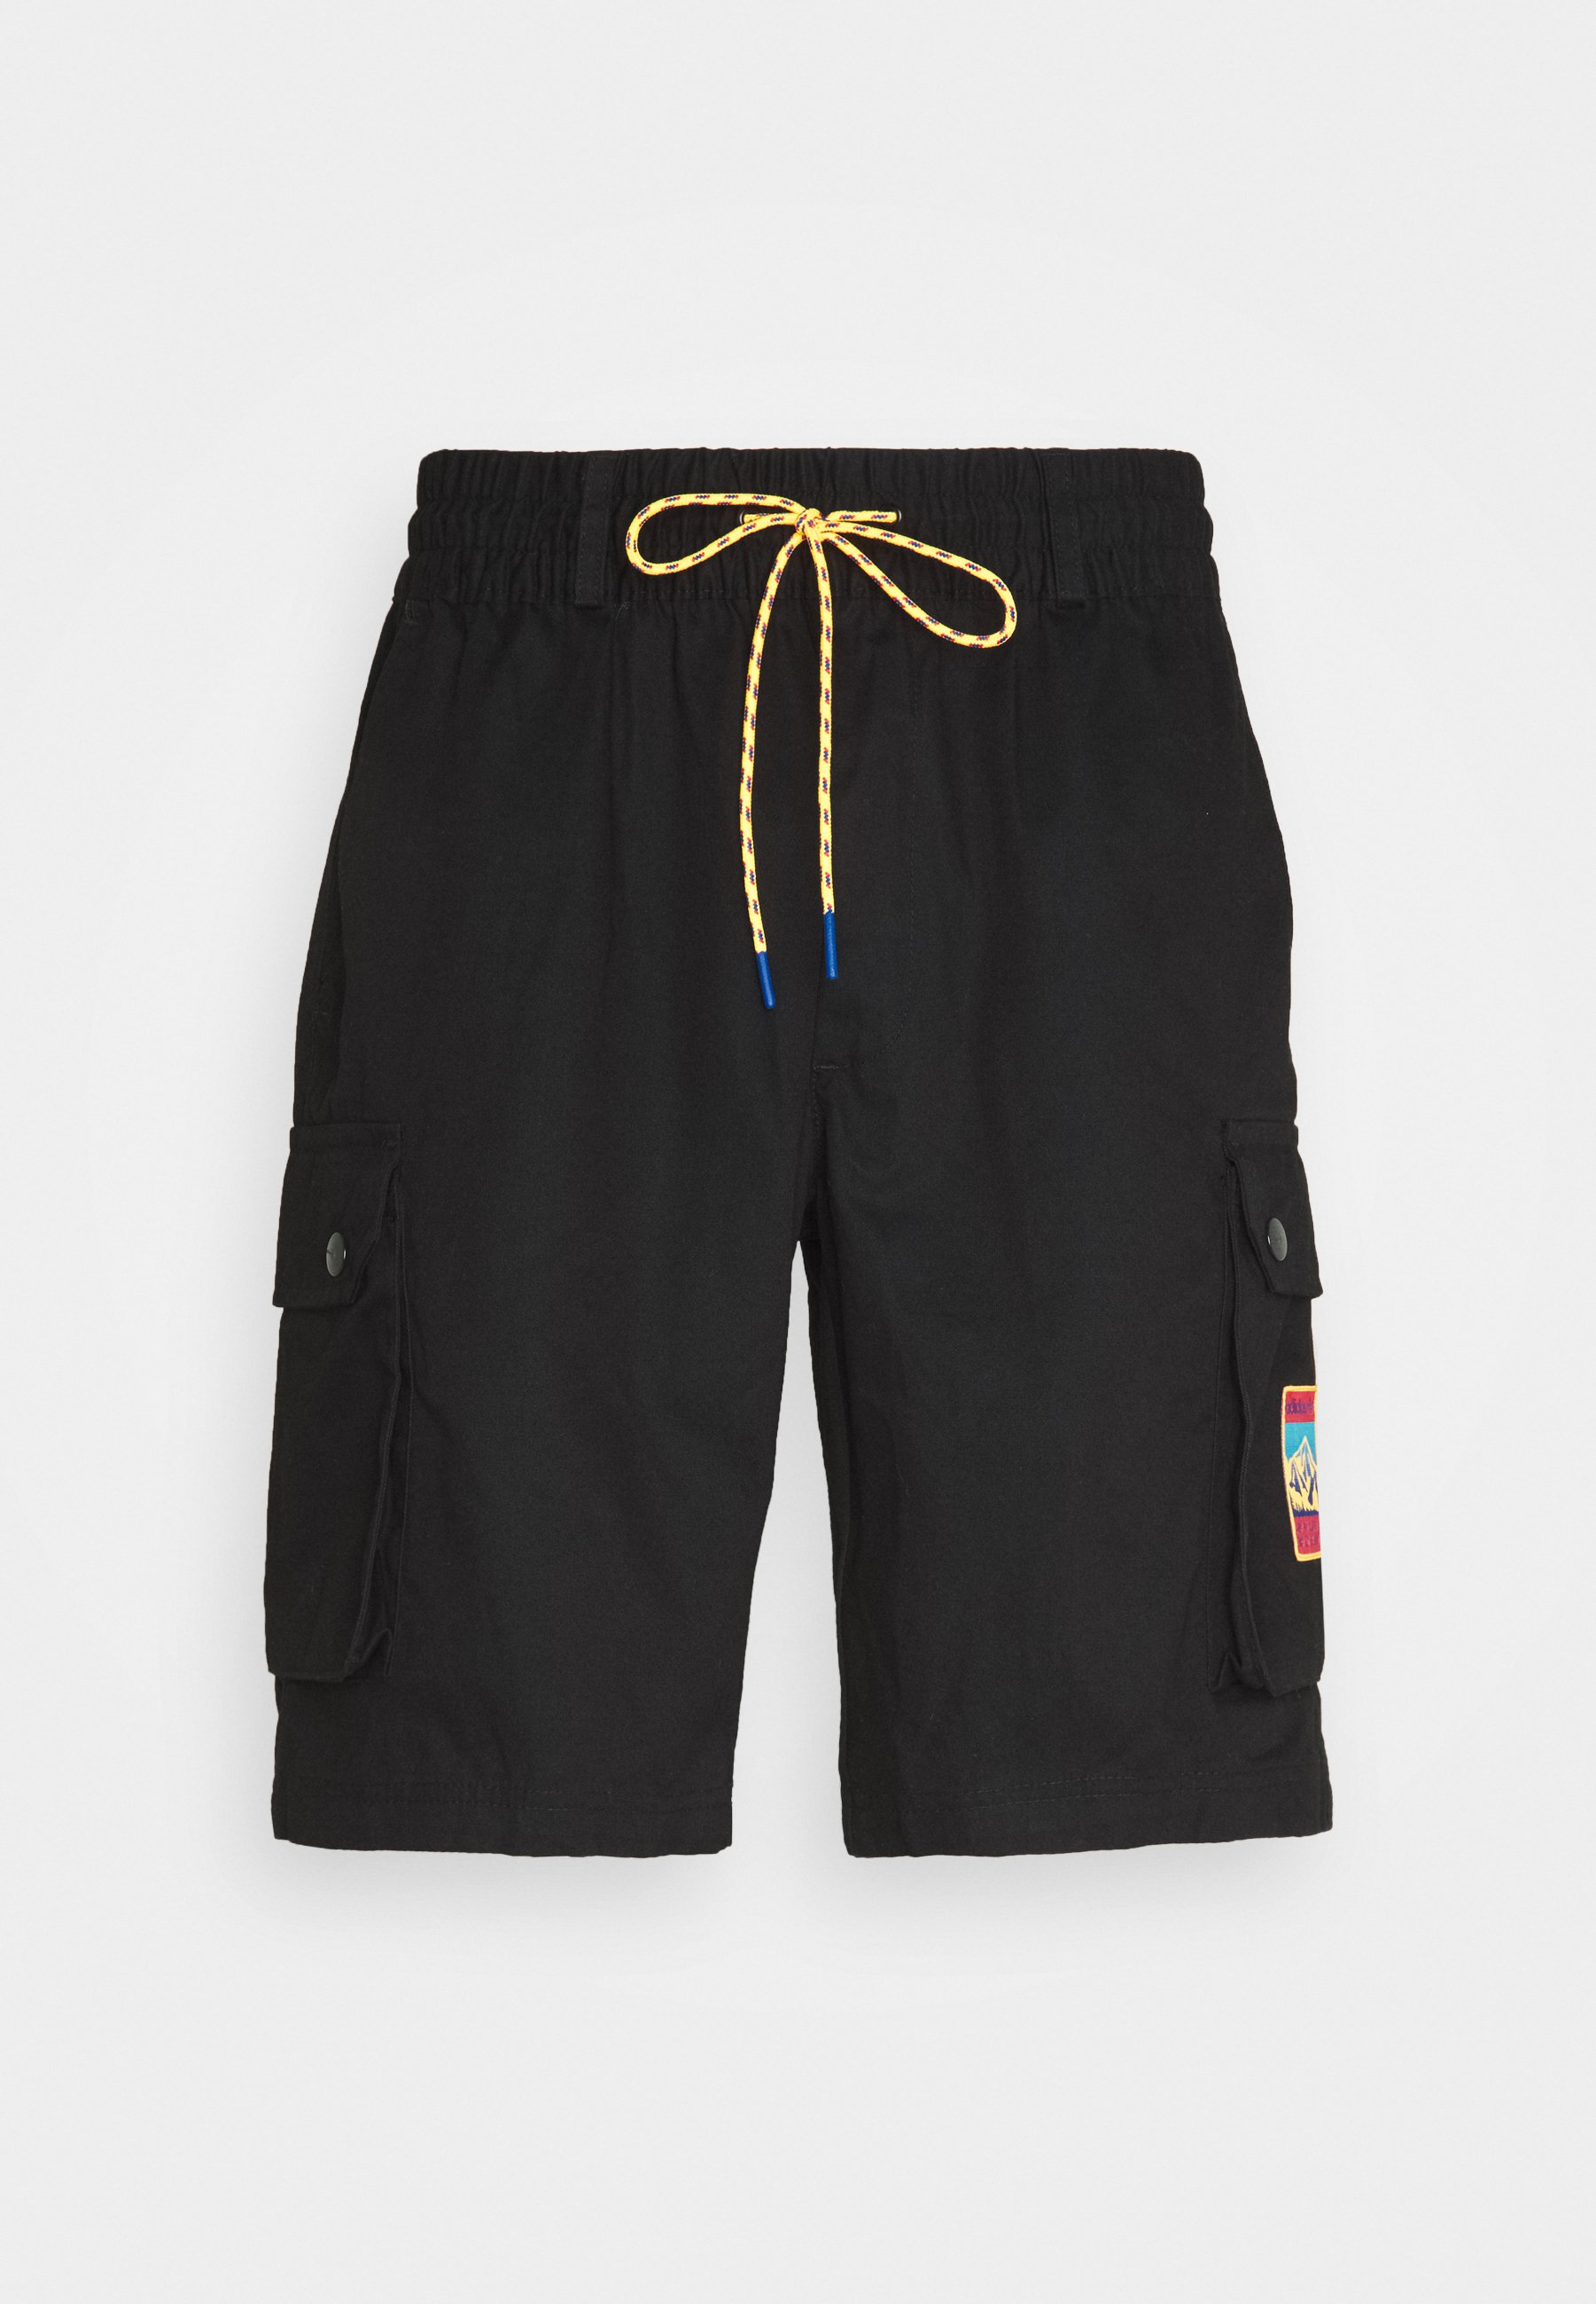 Adidas Originals Adplr Cargo Sports Inspired Shorts - Trace Khaki